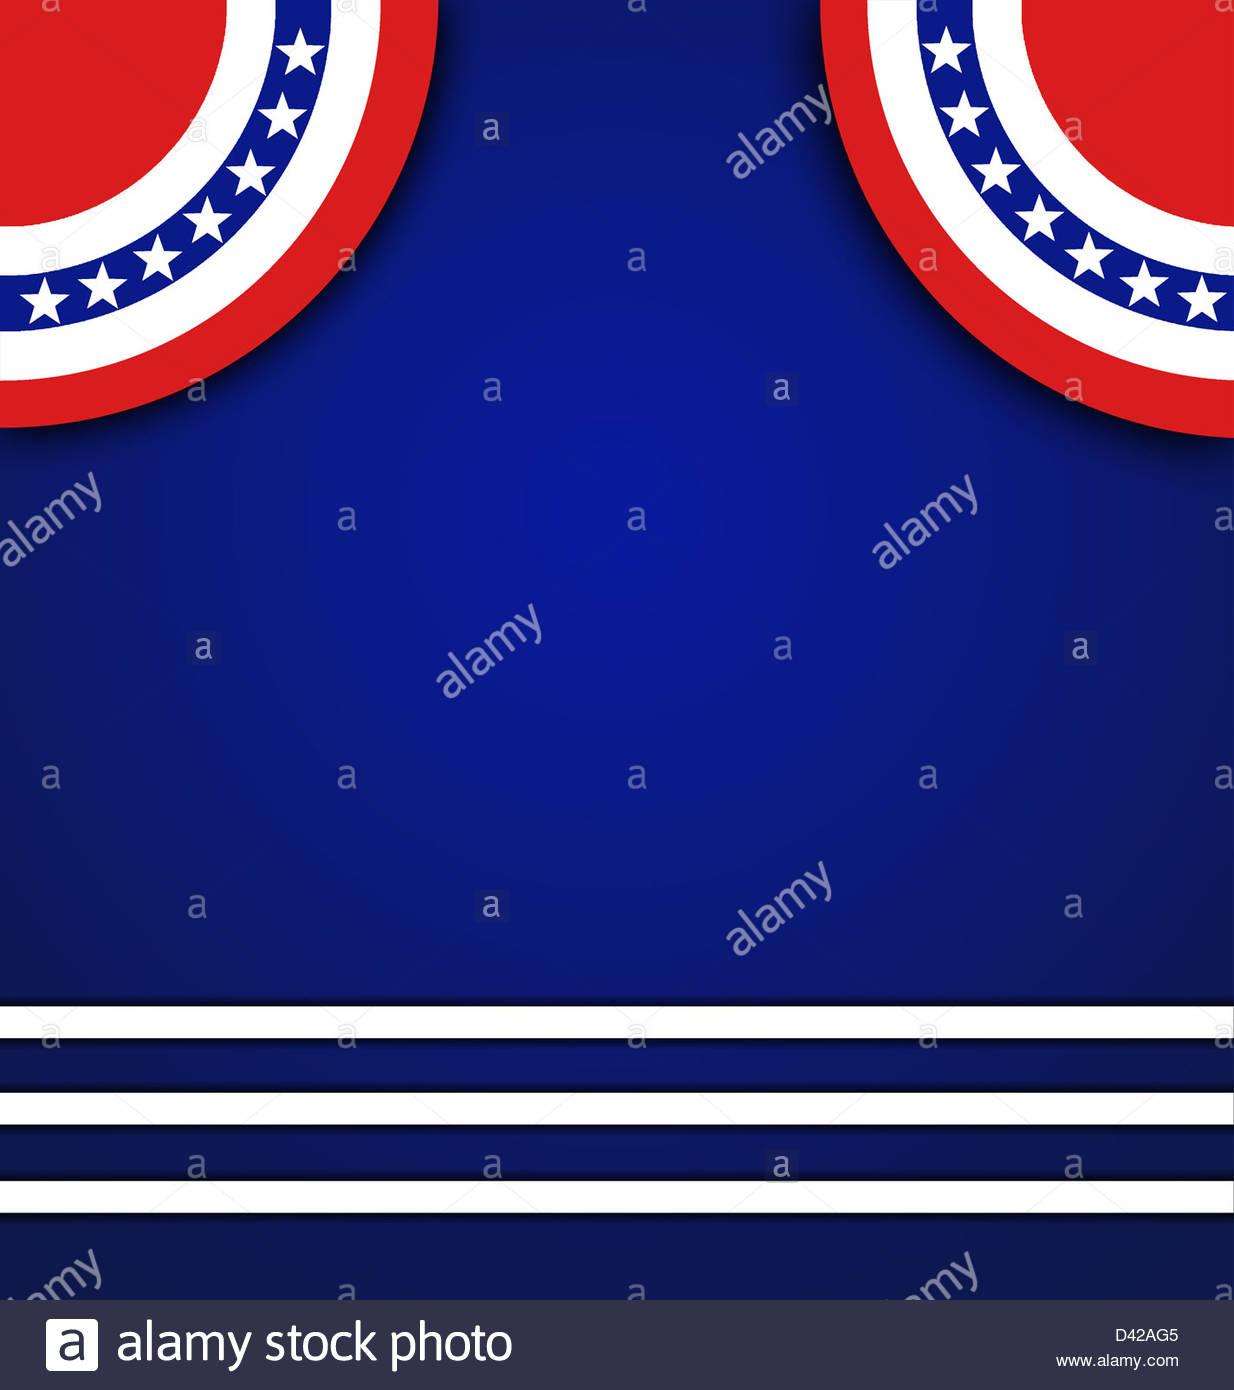 Campaign Background Stock Photo 54141925   Alamy 1234x1390